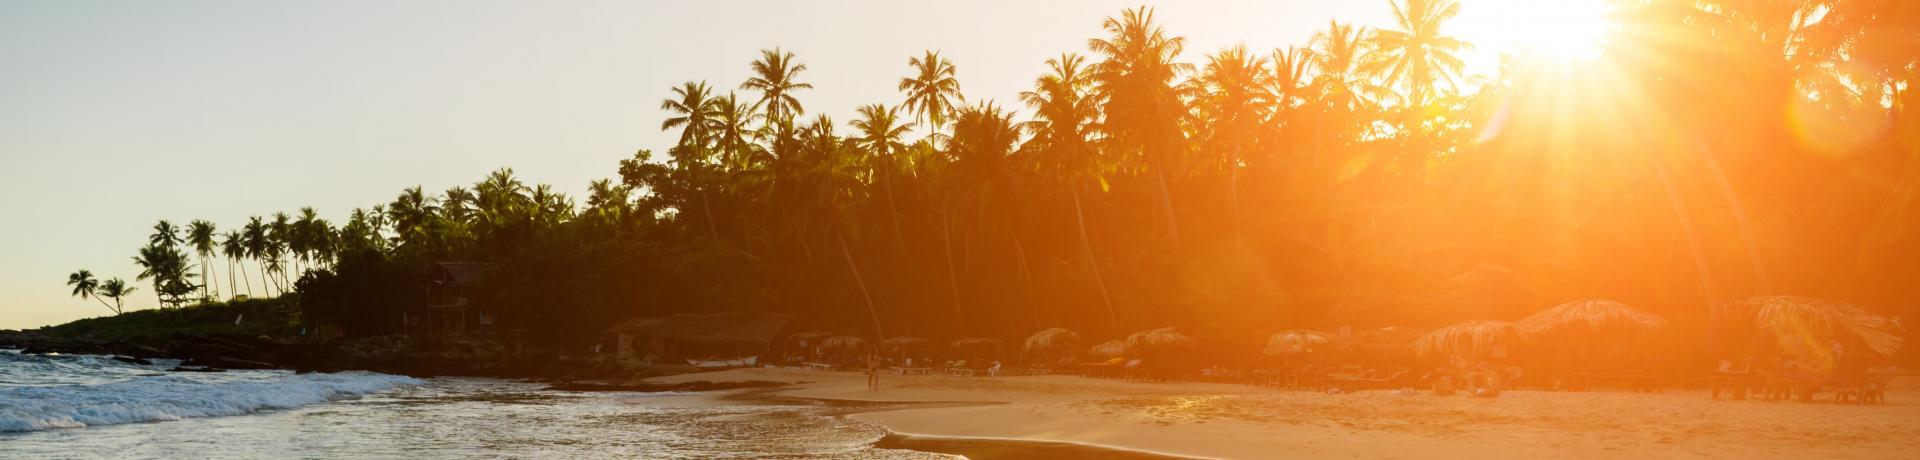 Sri-lanka-tangalle-Emotion_GI-831574234.jpg